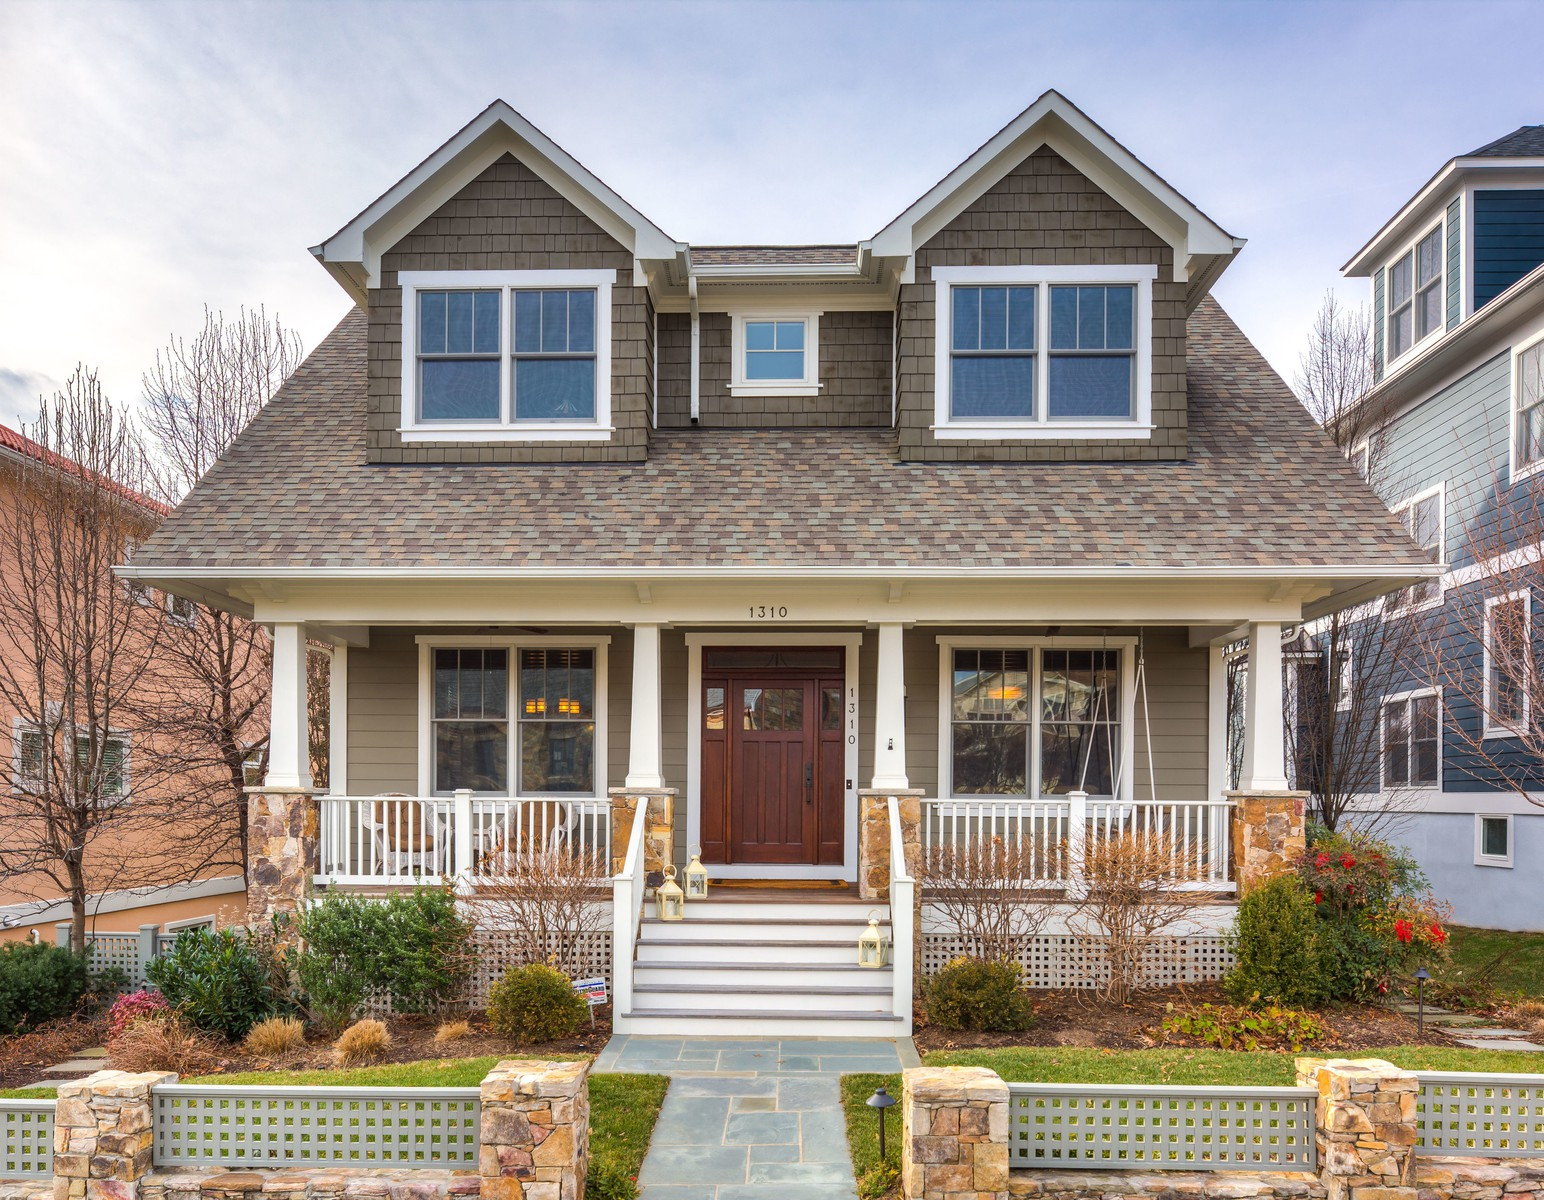 独户住宅 为 销售 在 Residence for Active, Urban Clarendon Lifestyle 1310 N Jackson St 阿林顿, 弗吉尼亚州, 22201 美国